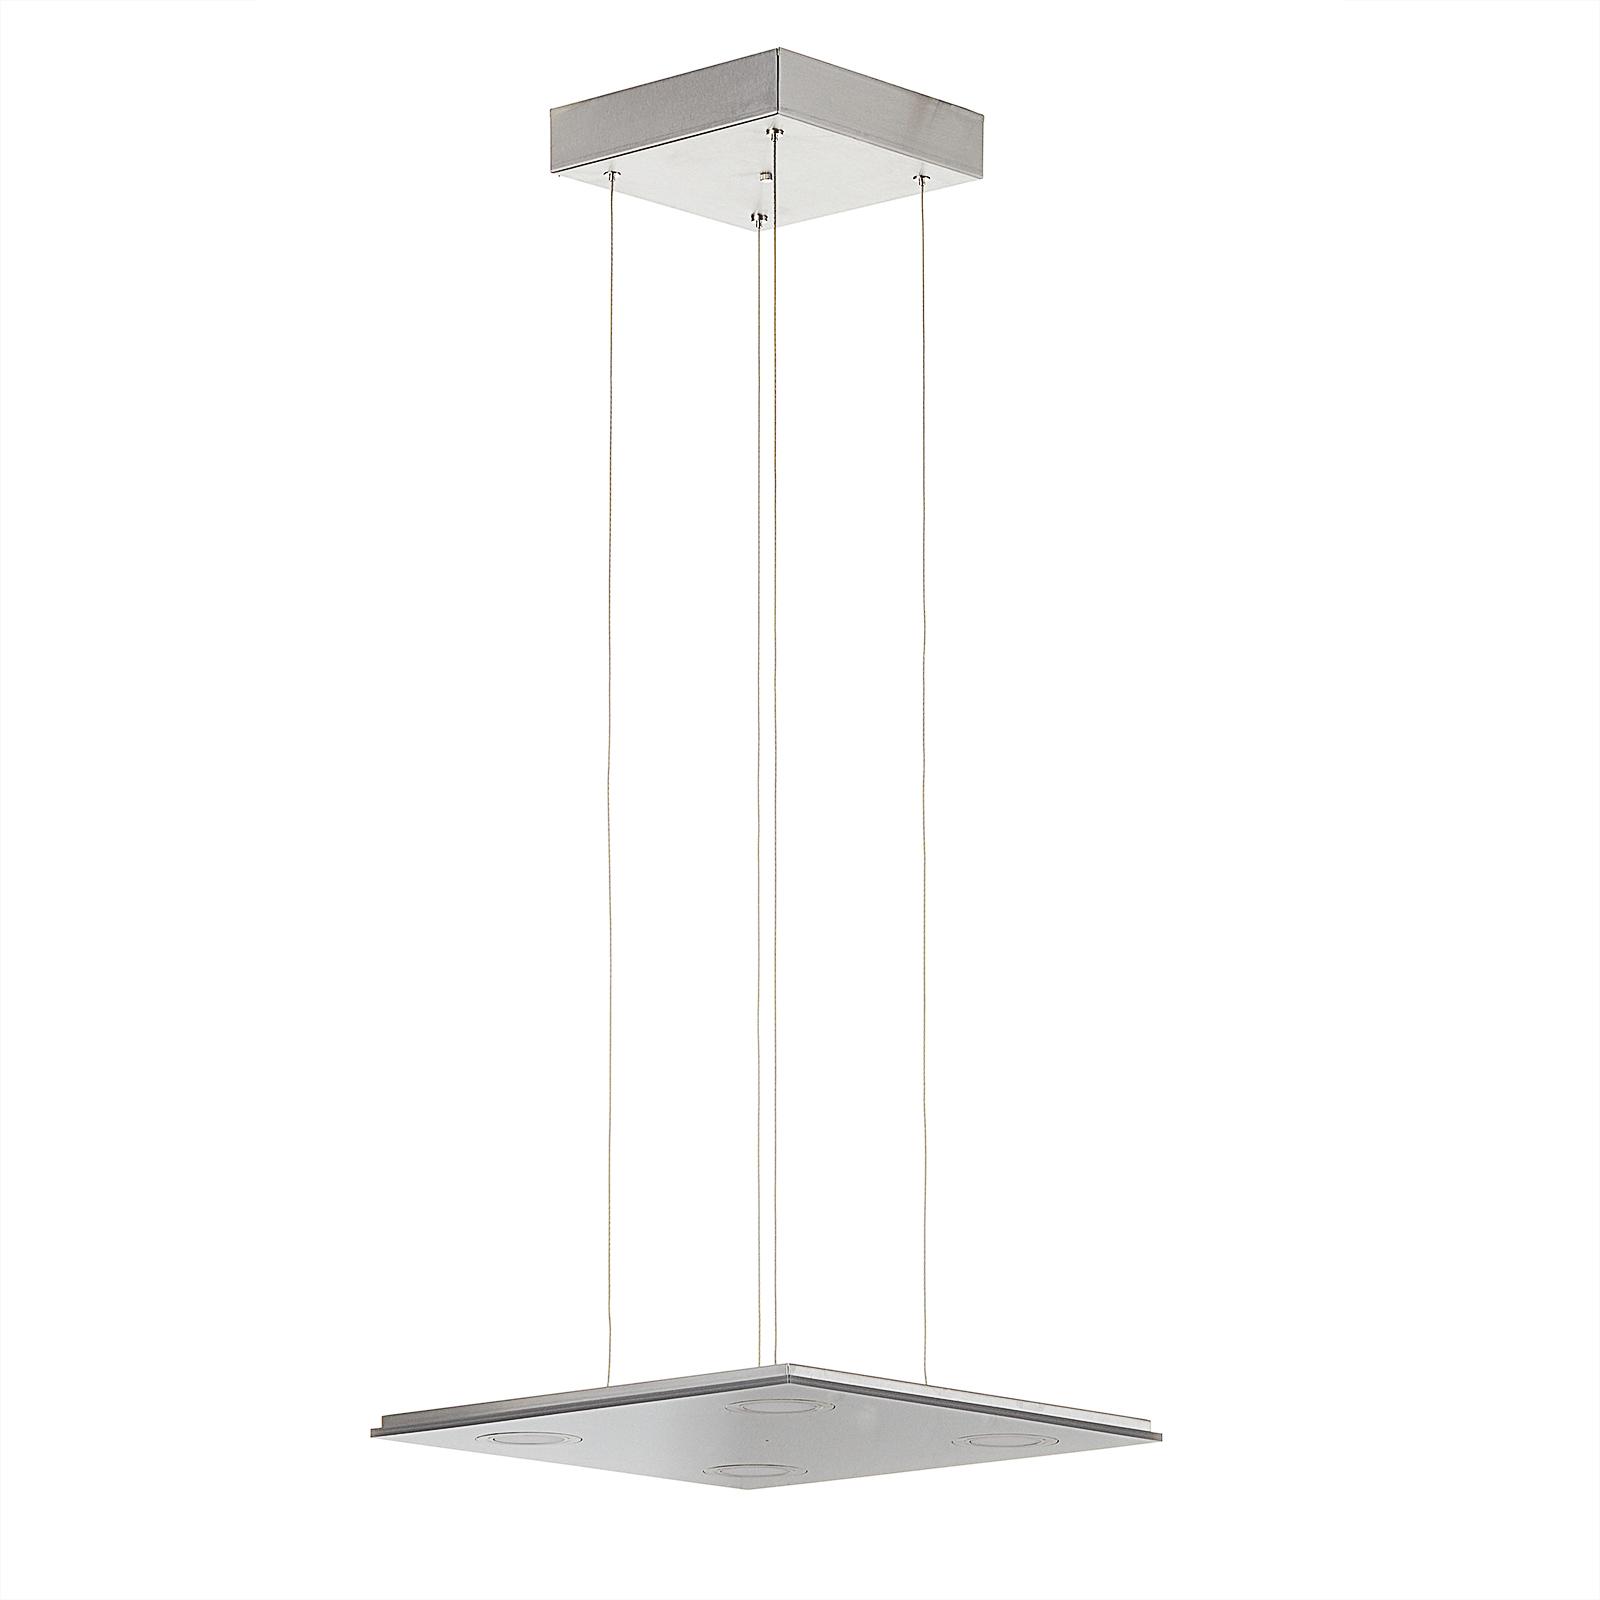 Kwadratowa lampa wisząca LED Pano, metal